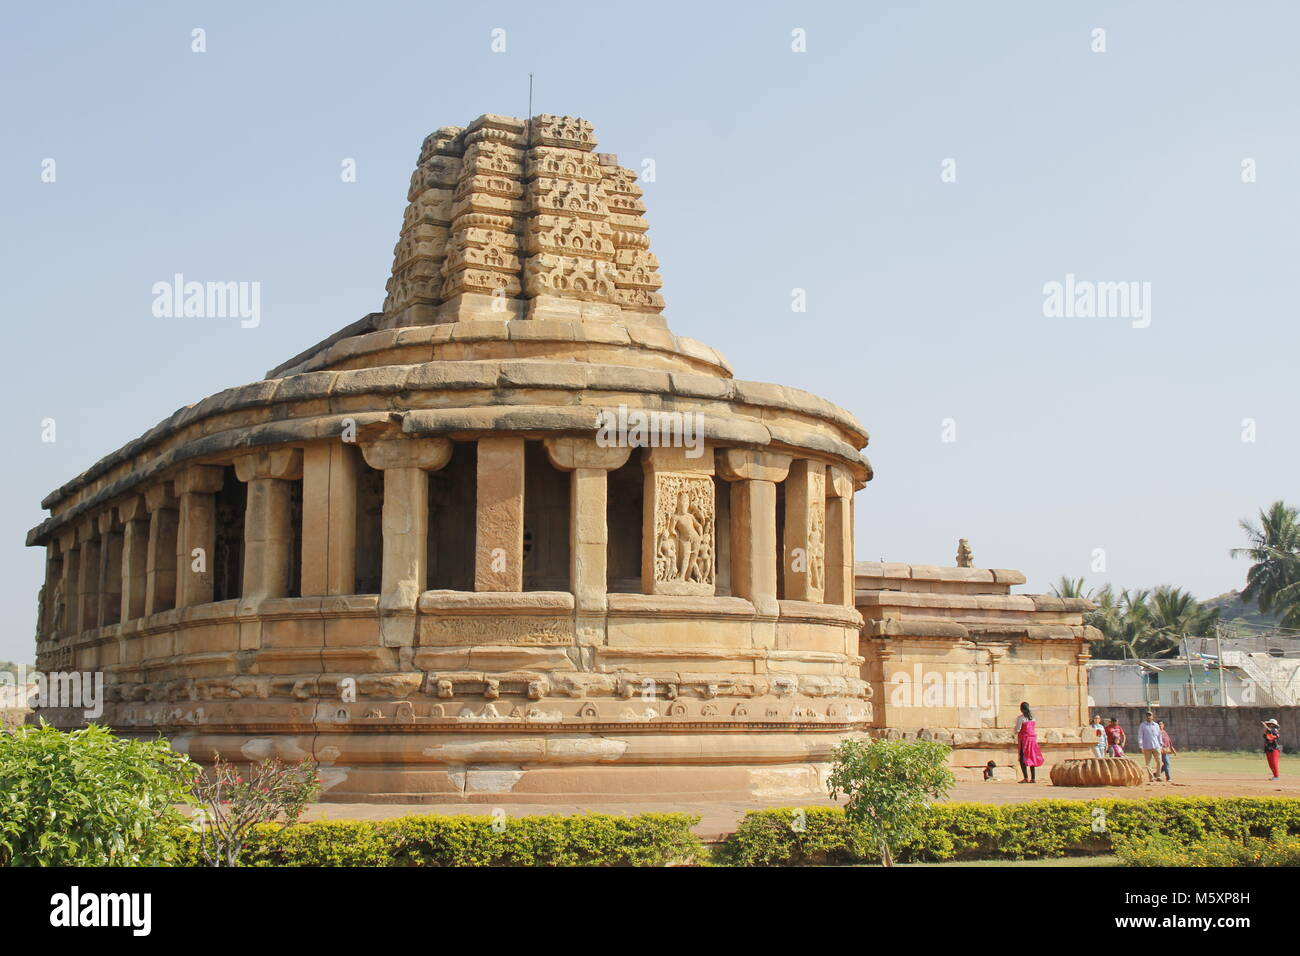 The Durga temple at Aihole, Karnataka - Stock Image